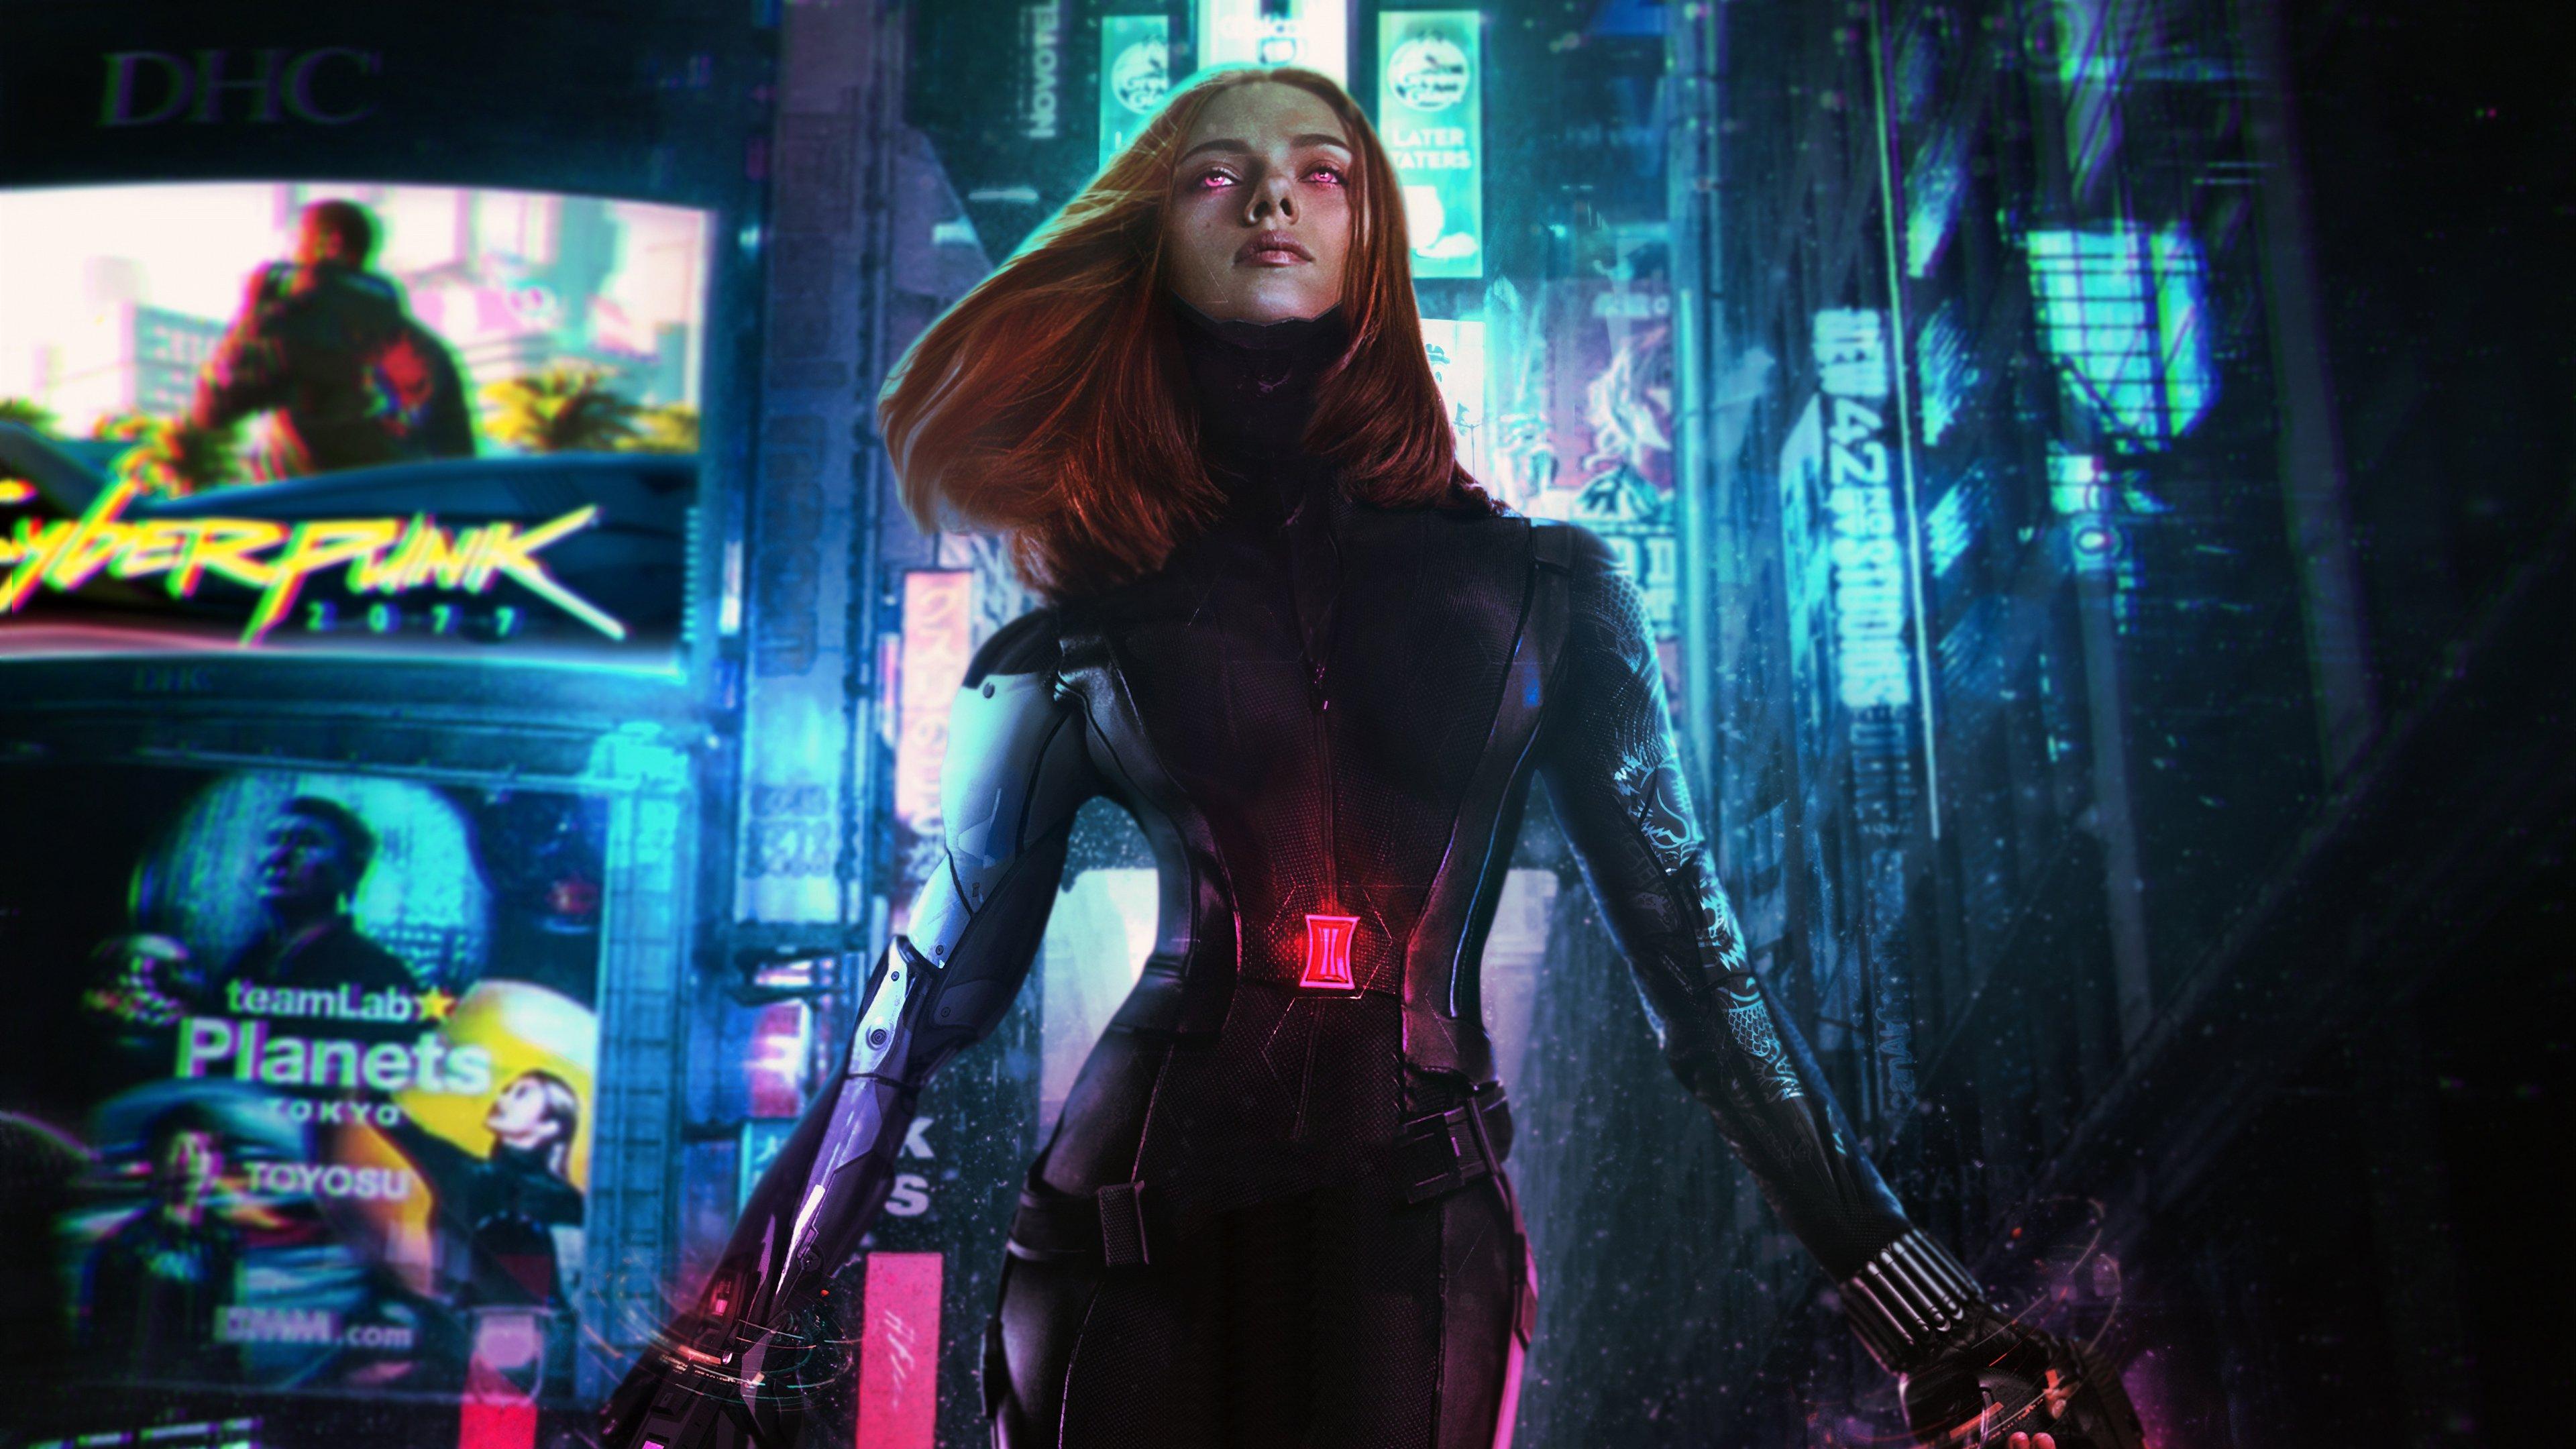 Fondos de pantalla Cyberpunk Viuda Negra Fanart